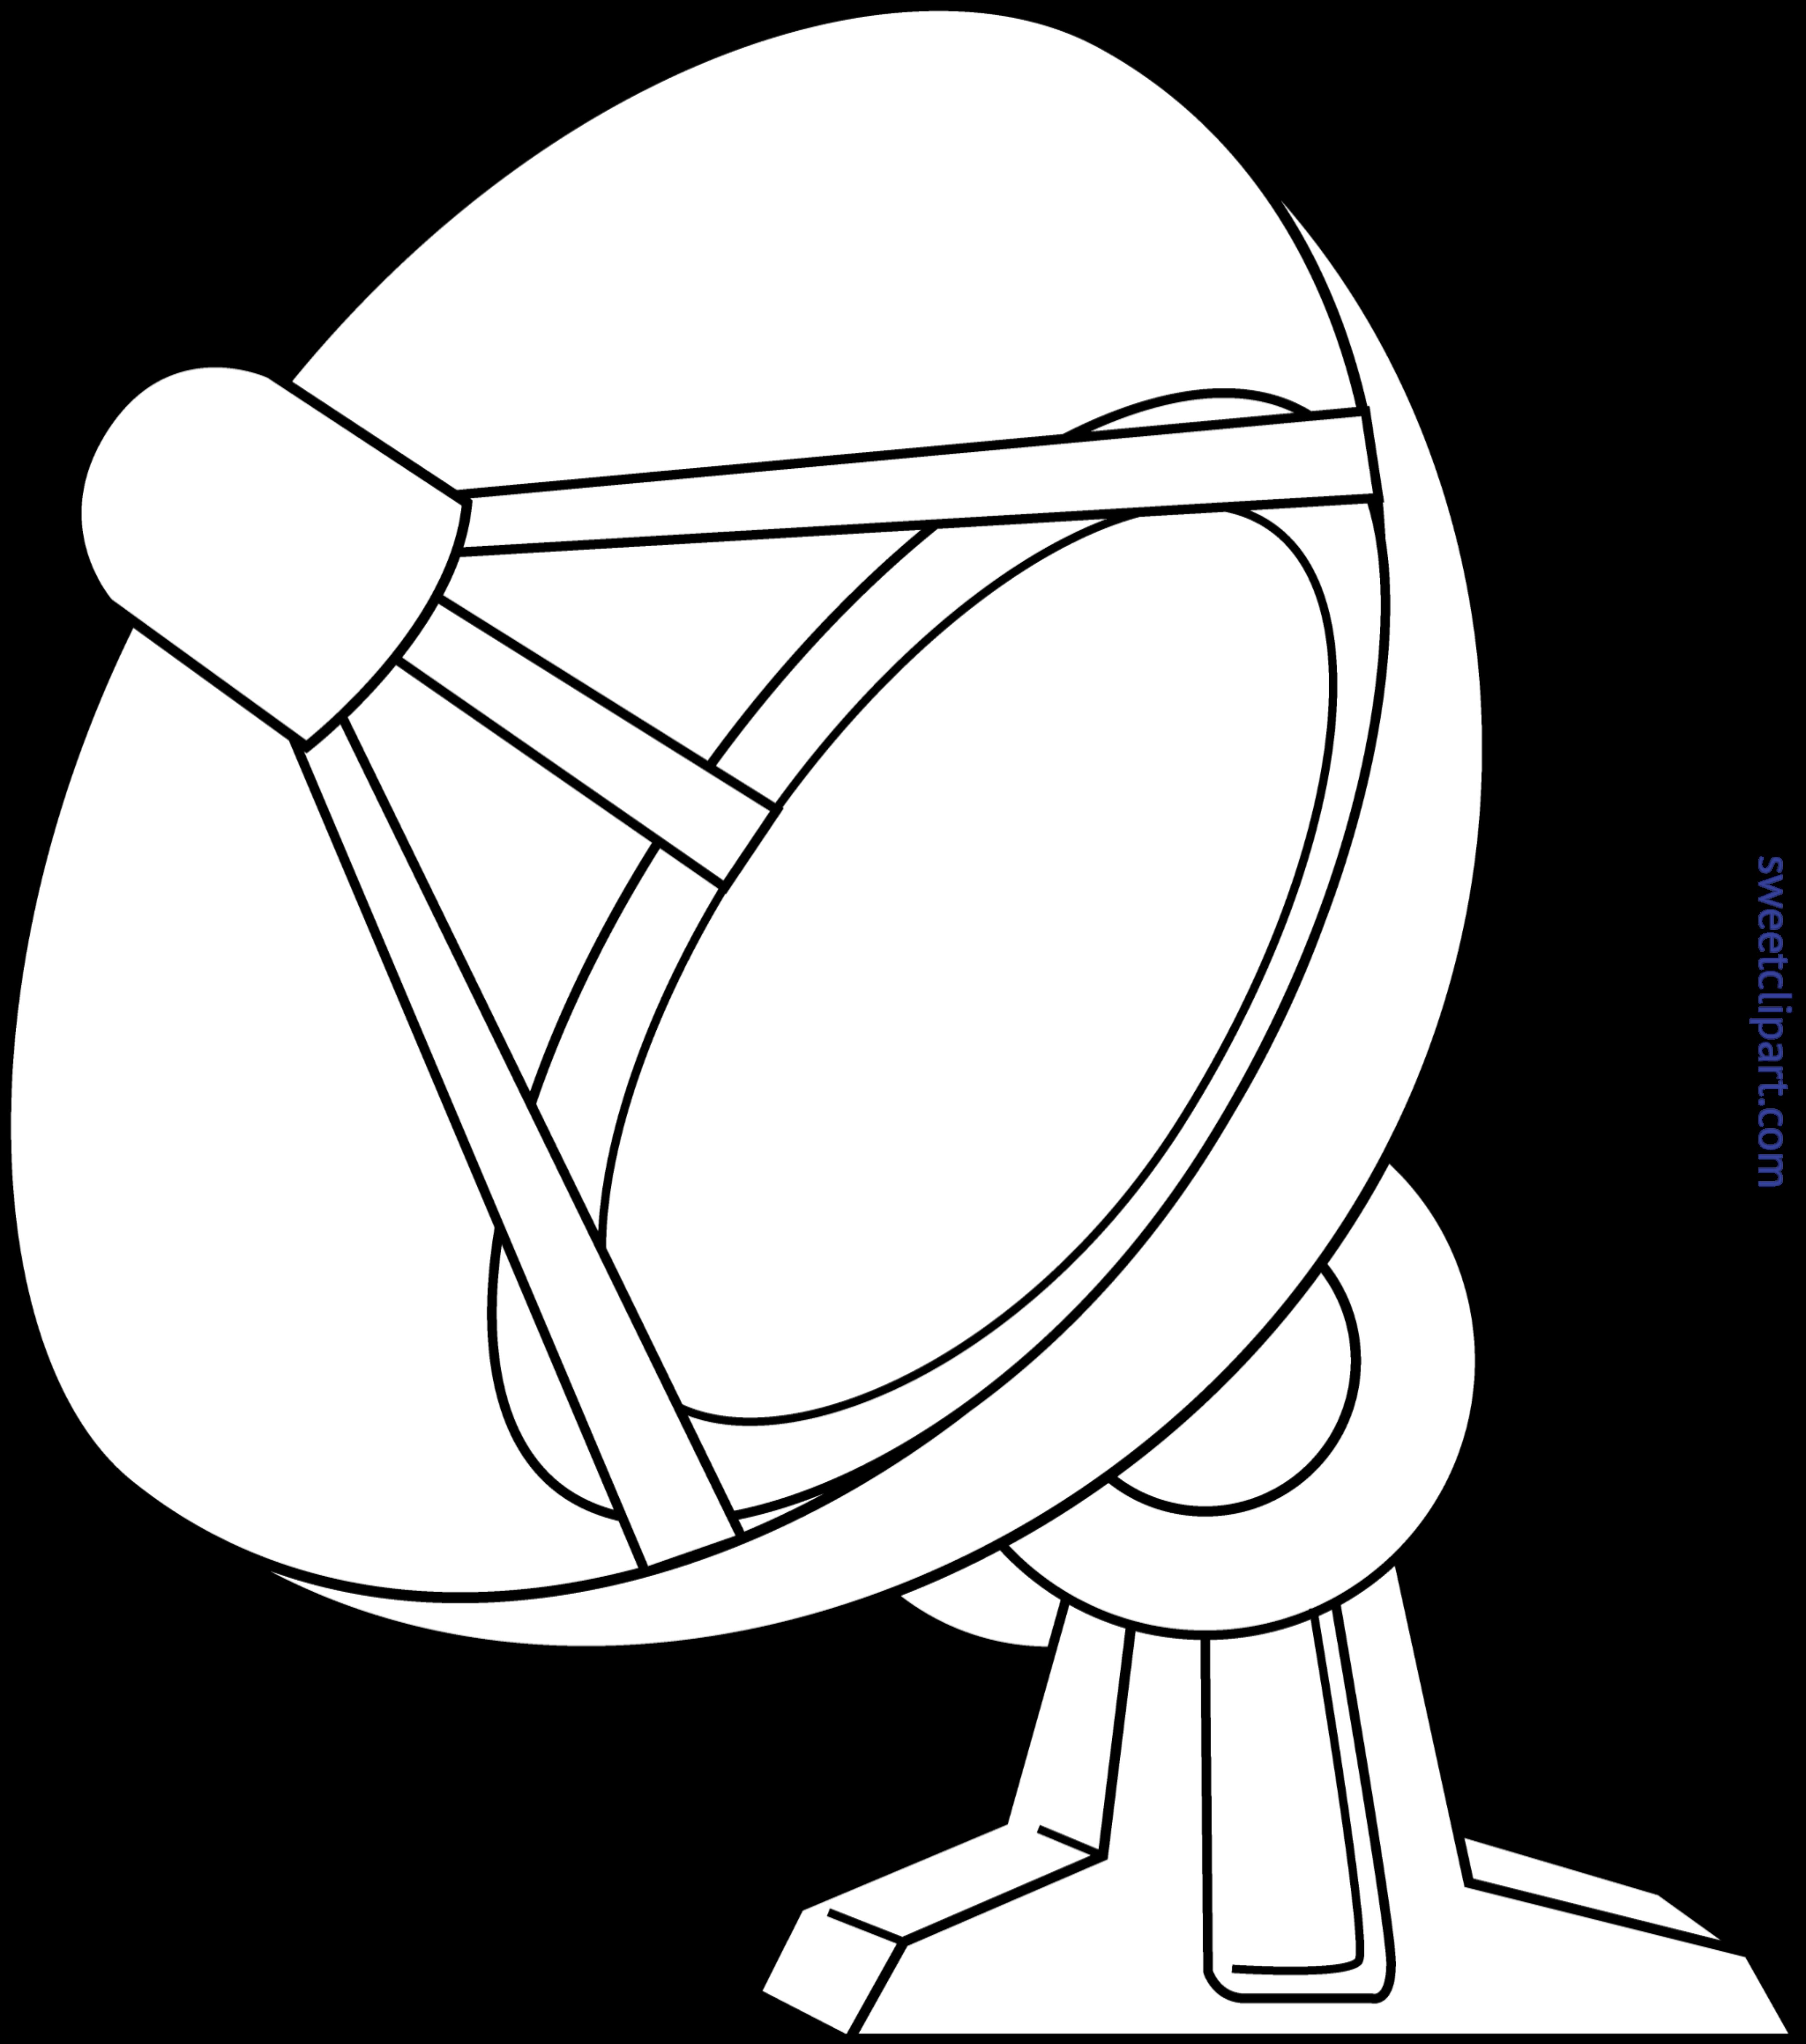 Clipart tv drawing. Satellite dish at getdrawings